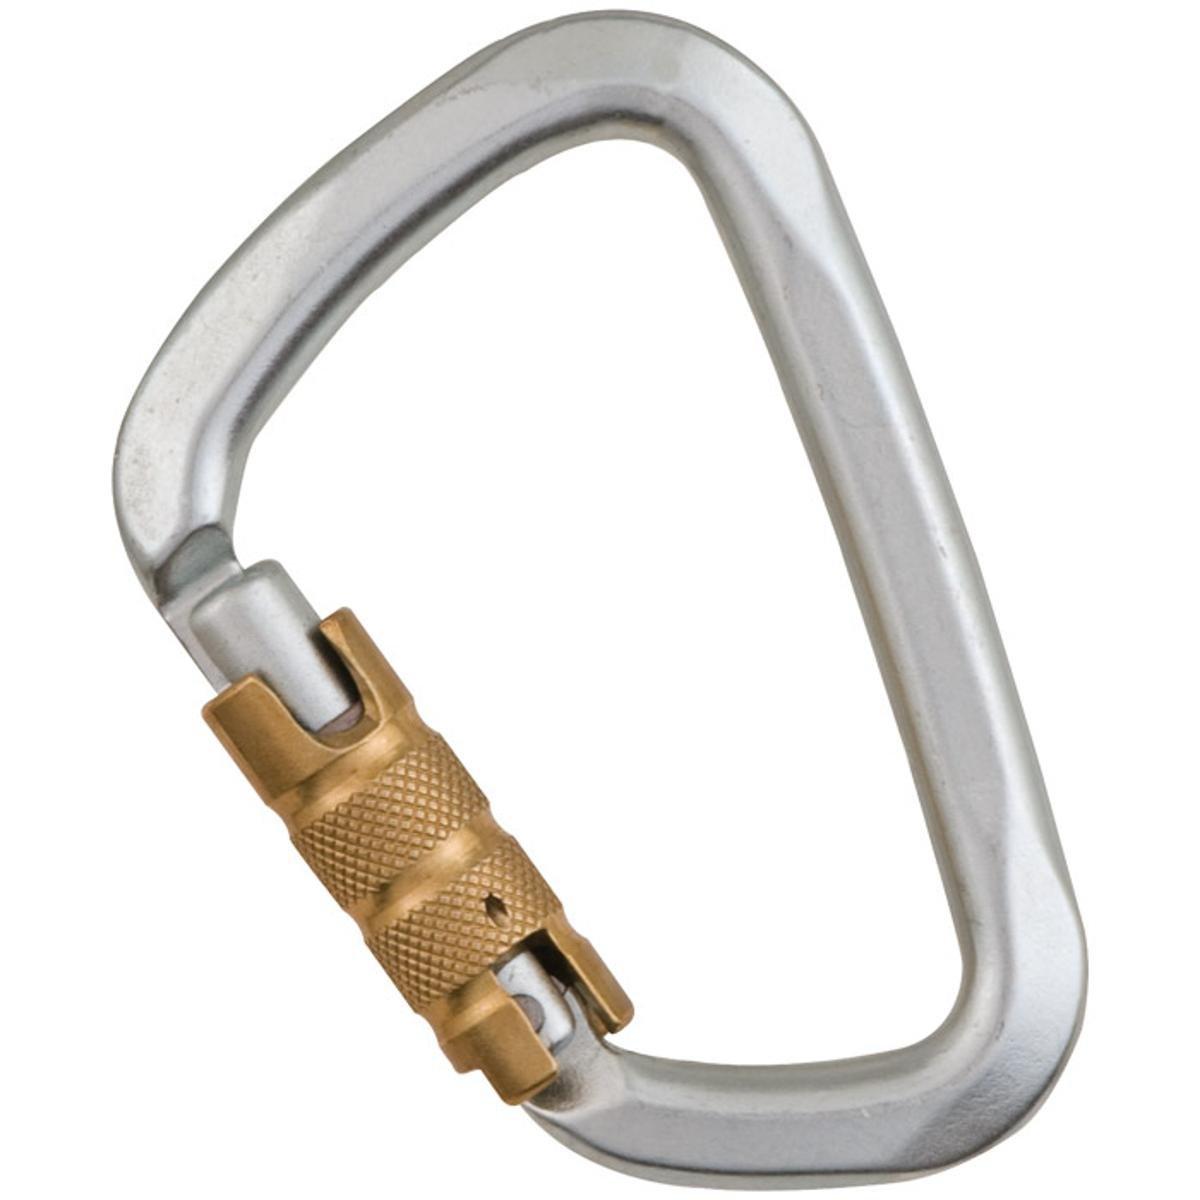 434668 Large Liberty Mountain Hard Steel D Key 3 Stage Auto Lock Carabiner